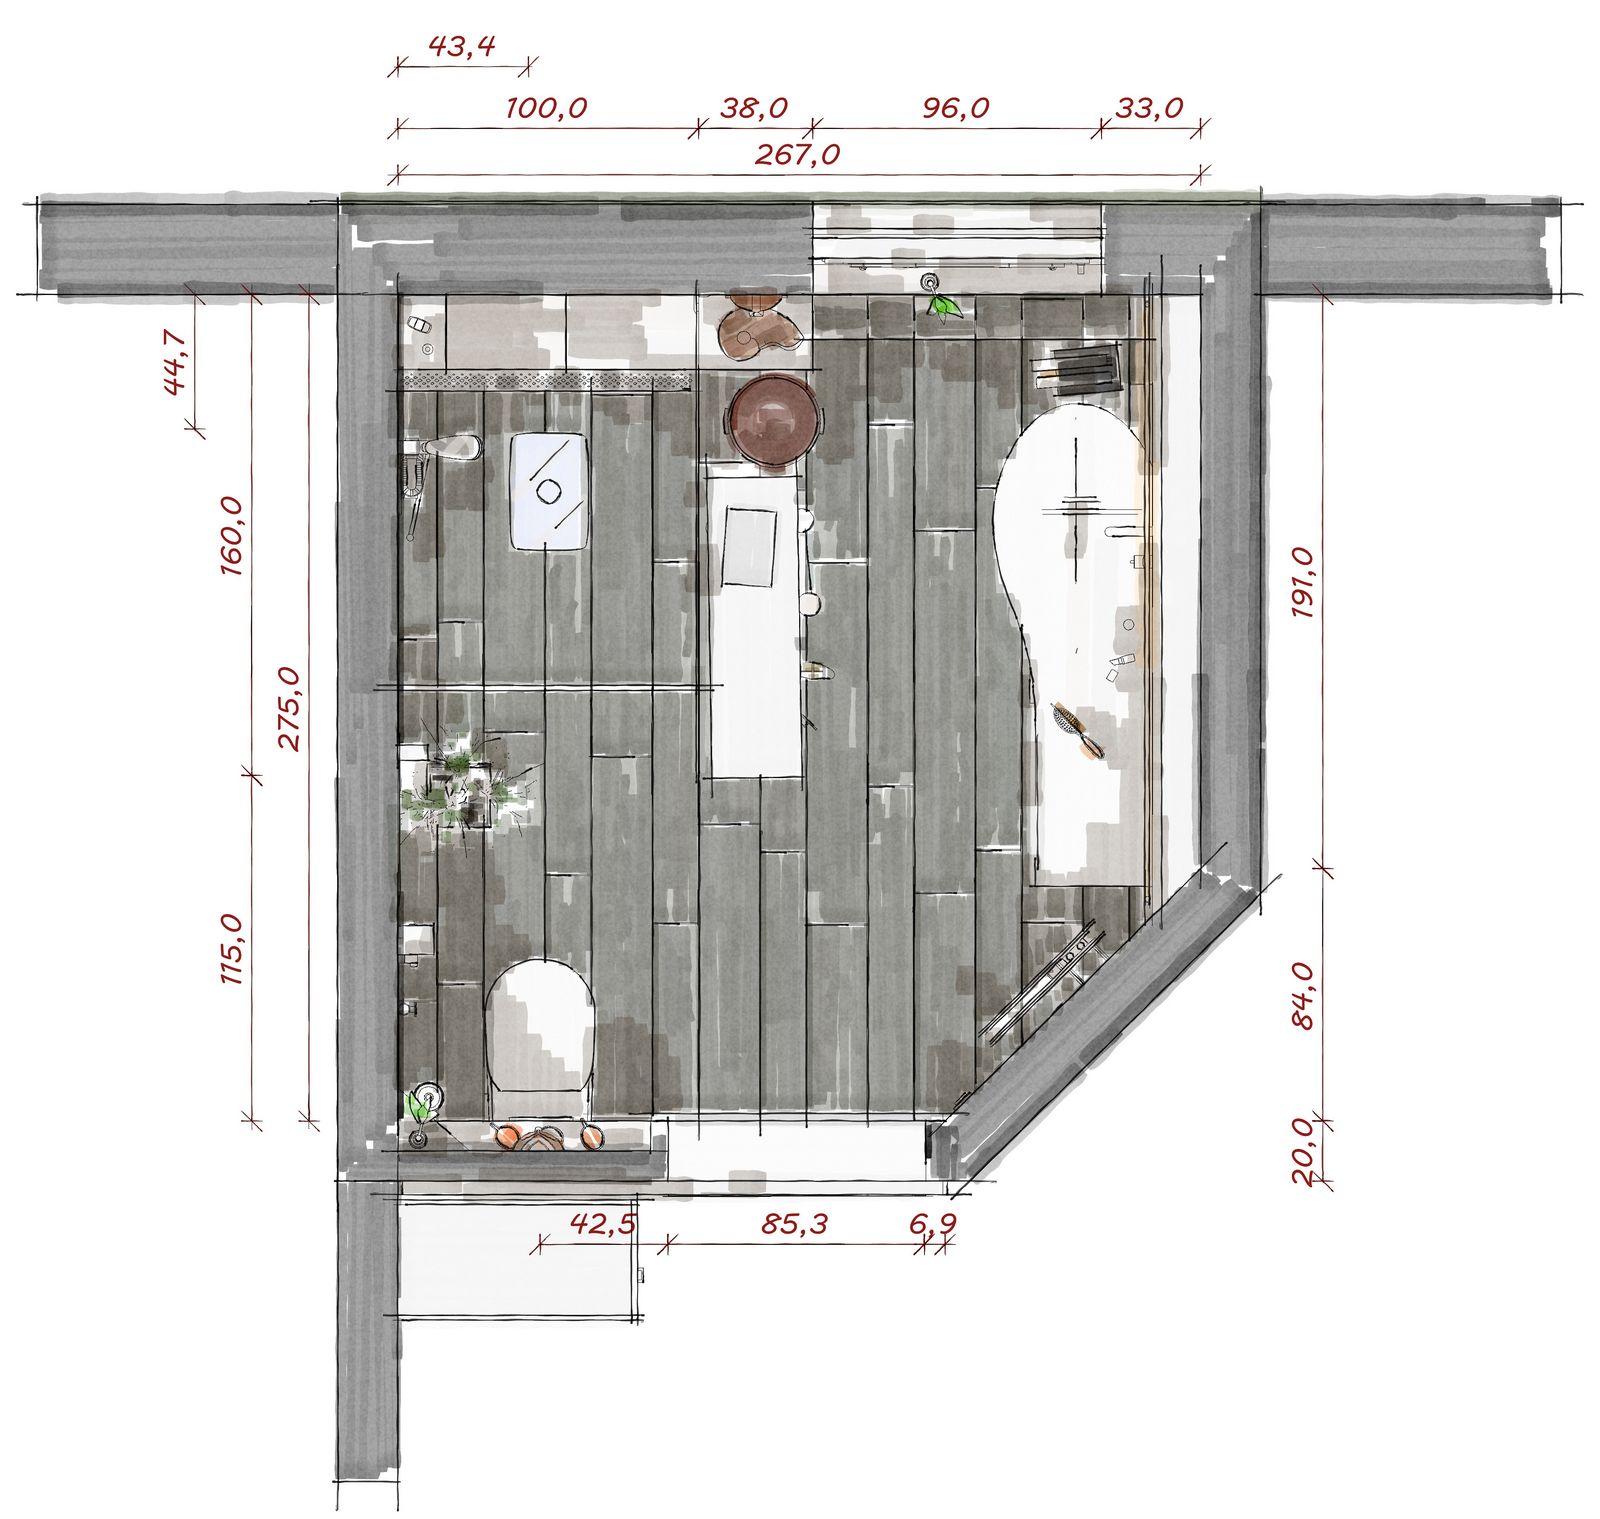 fishzerocom offene dusche planen verschiedene design inspiration - Offene Dusche Planen